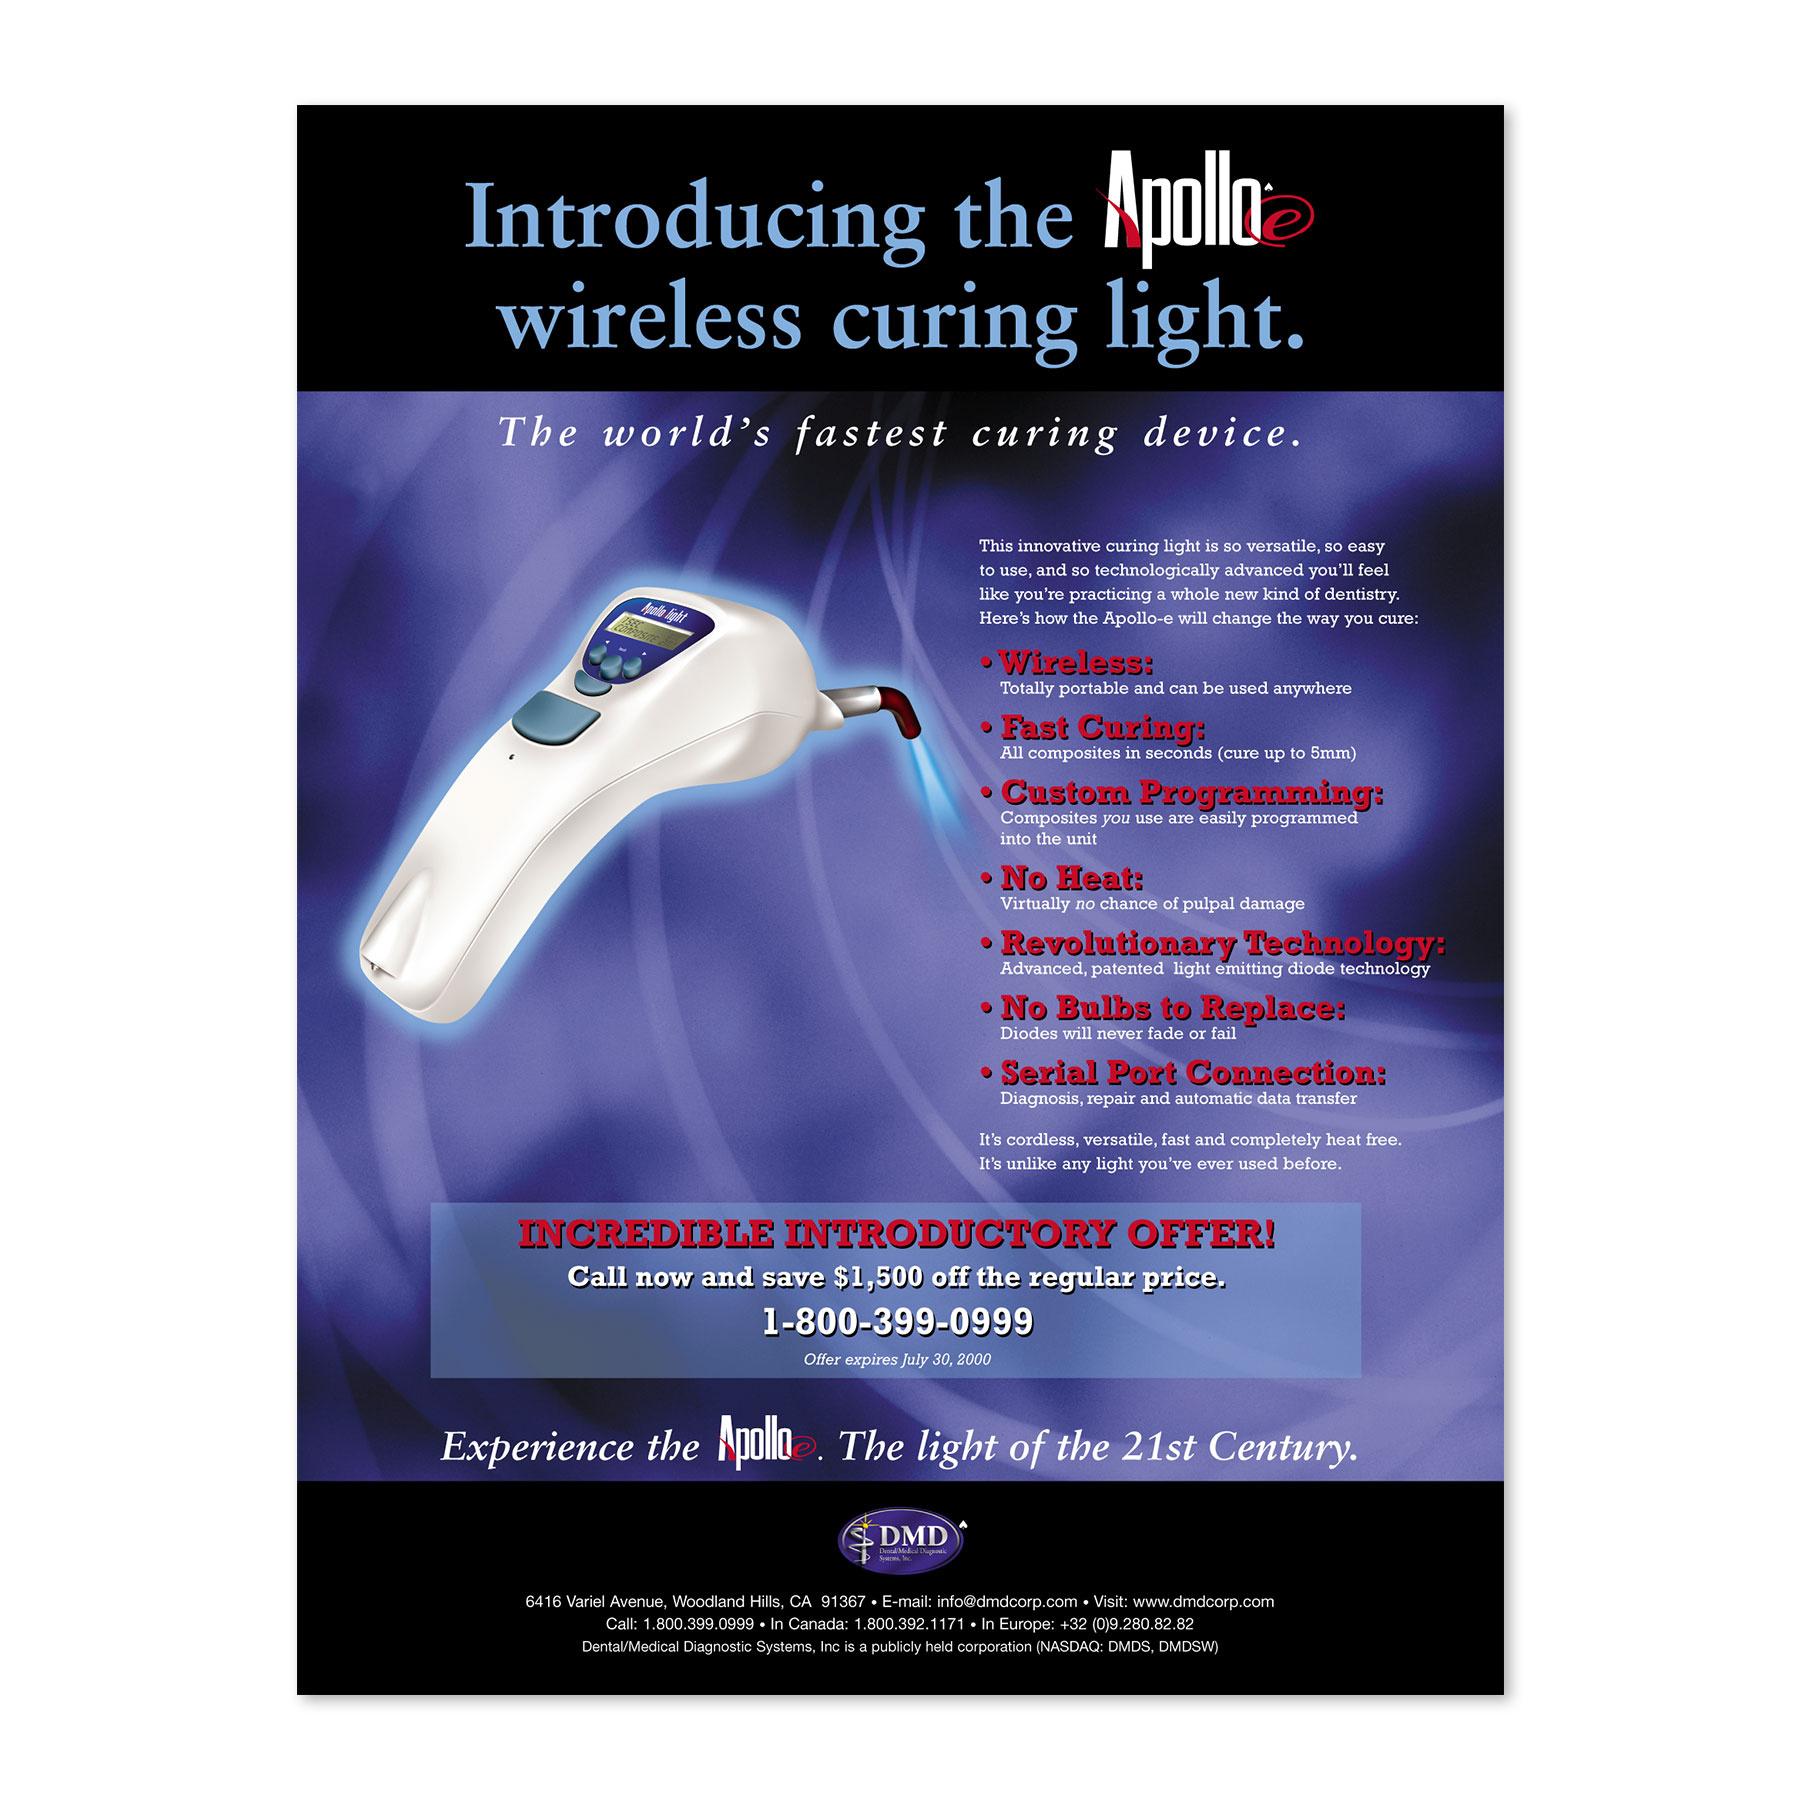 DMD Apollo Dental Products Report Magazine Ad